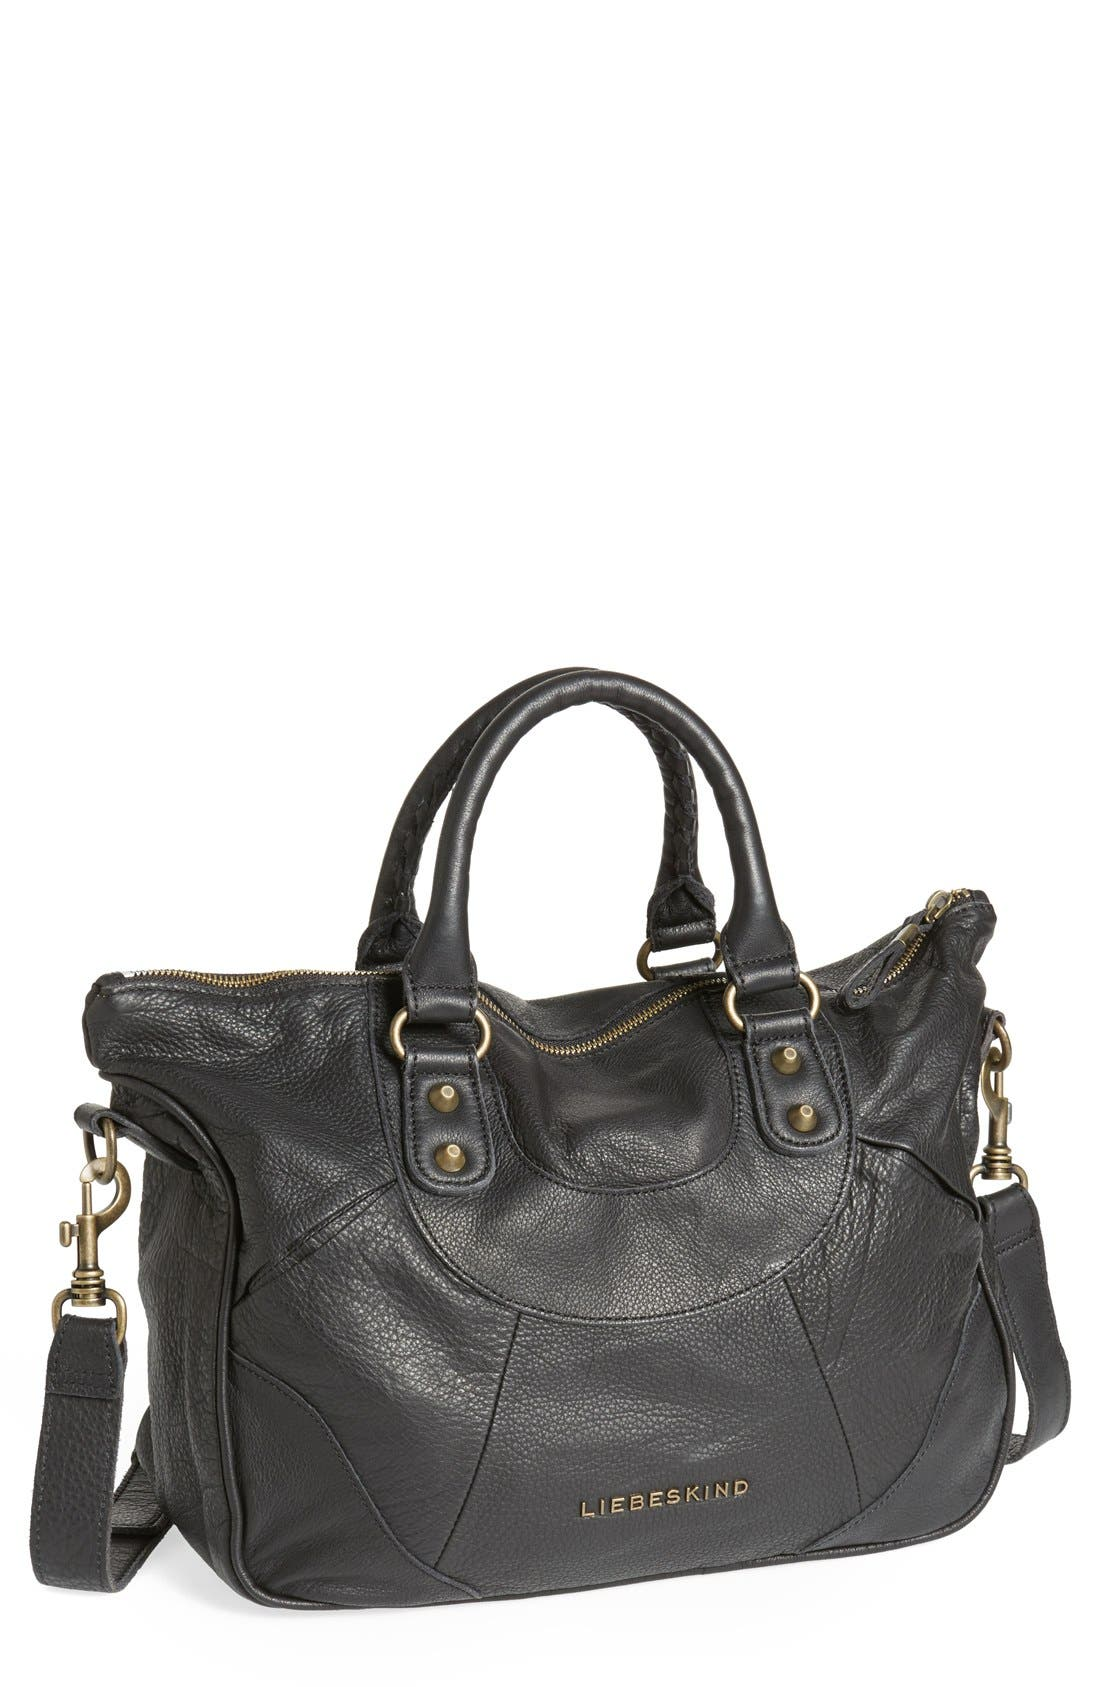 Alternate Image 1 Selected - Liebeskind 'Vintage Esther' Soft Leather Tote